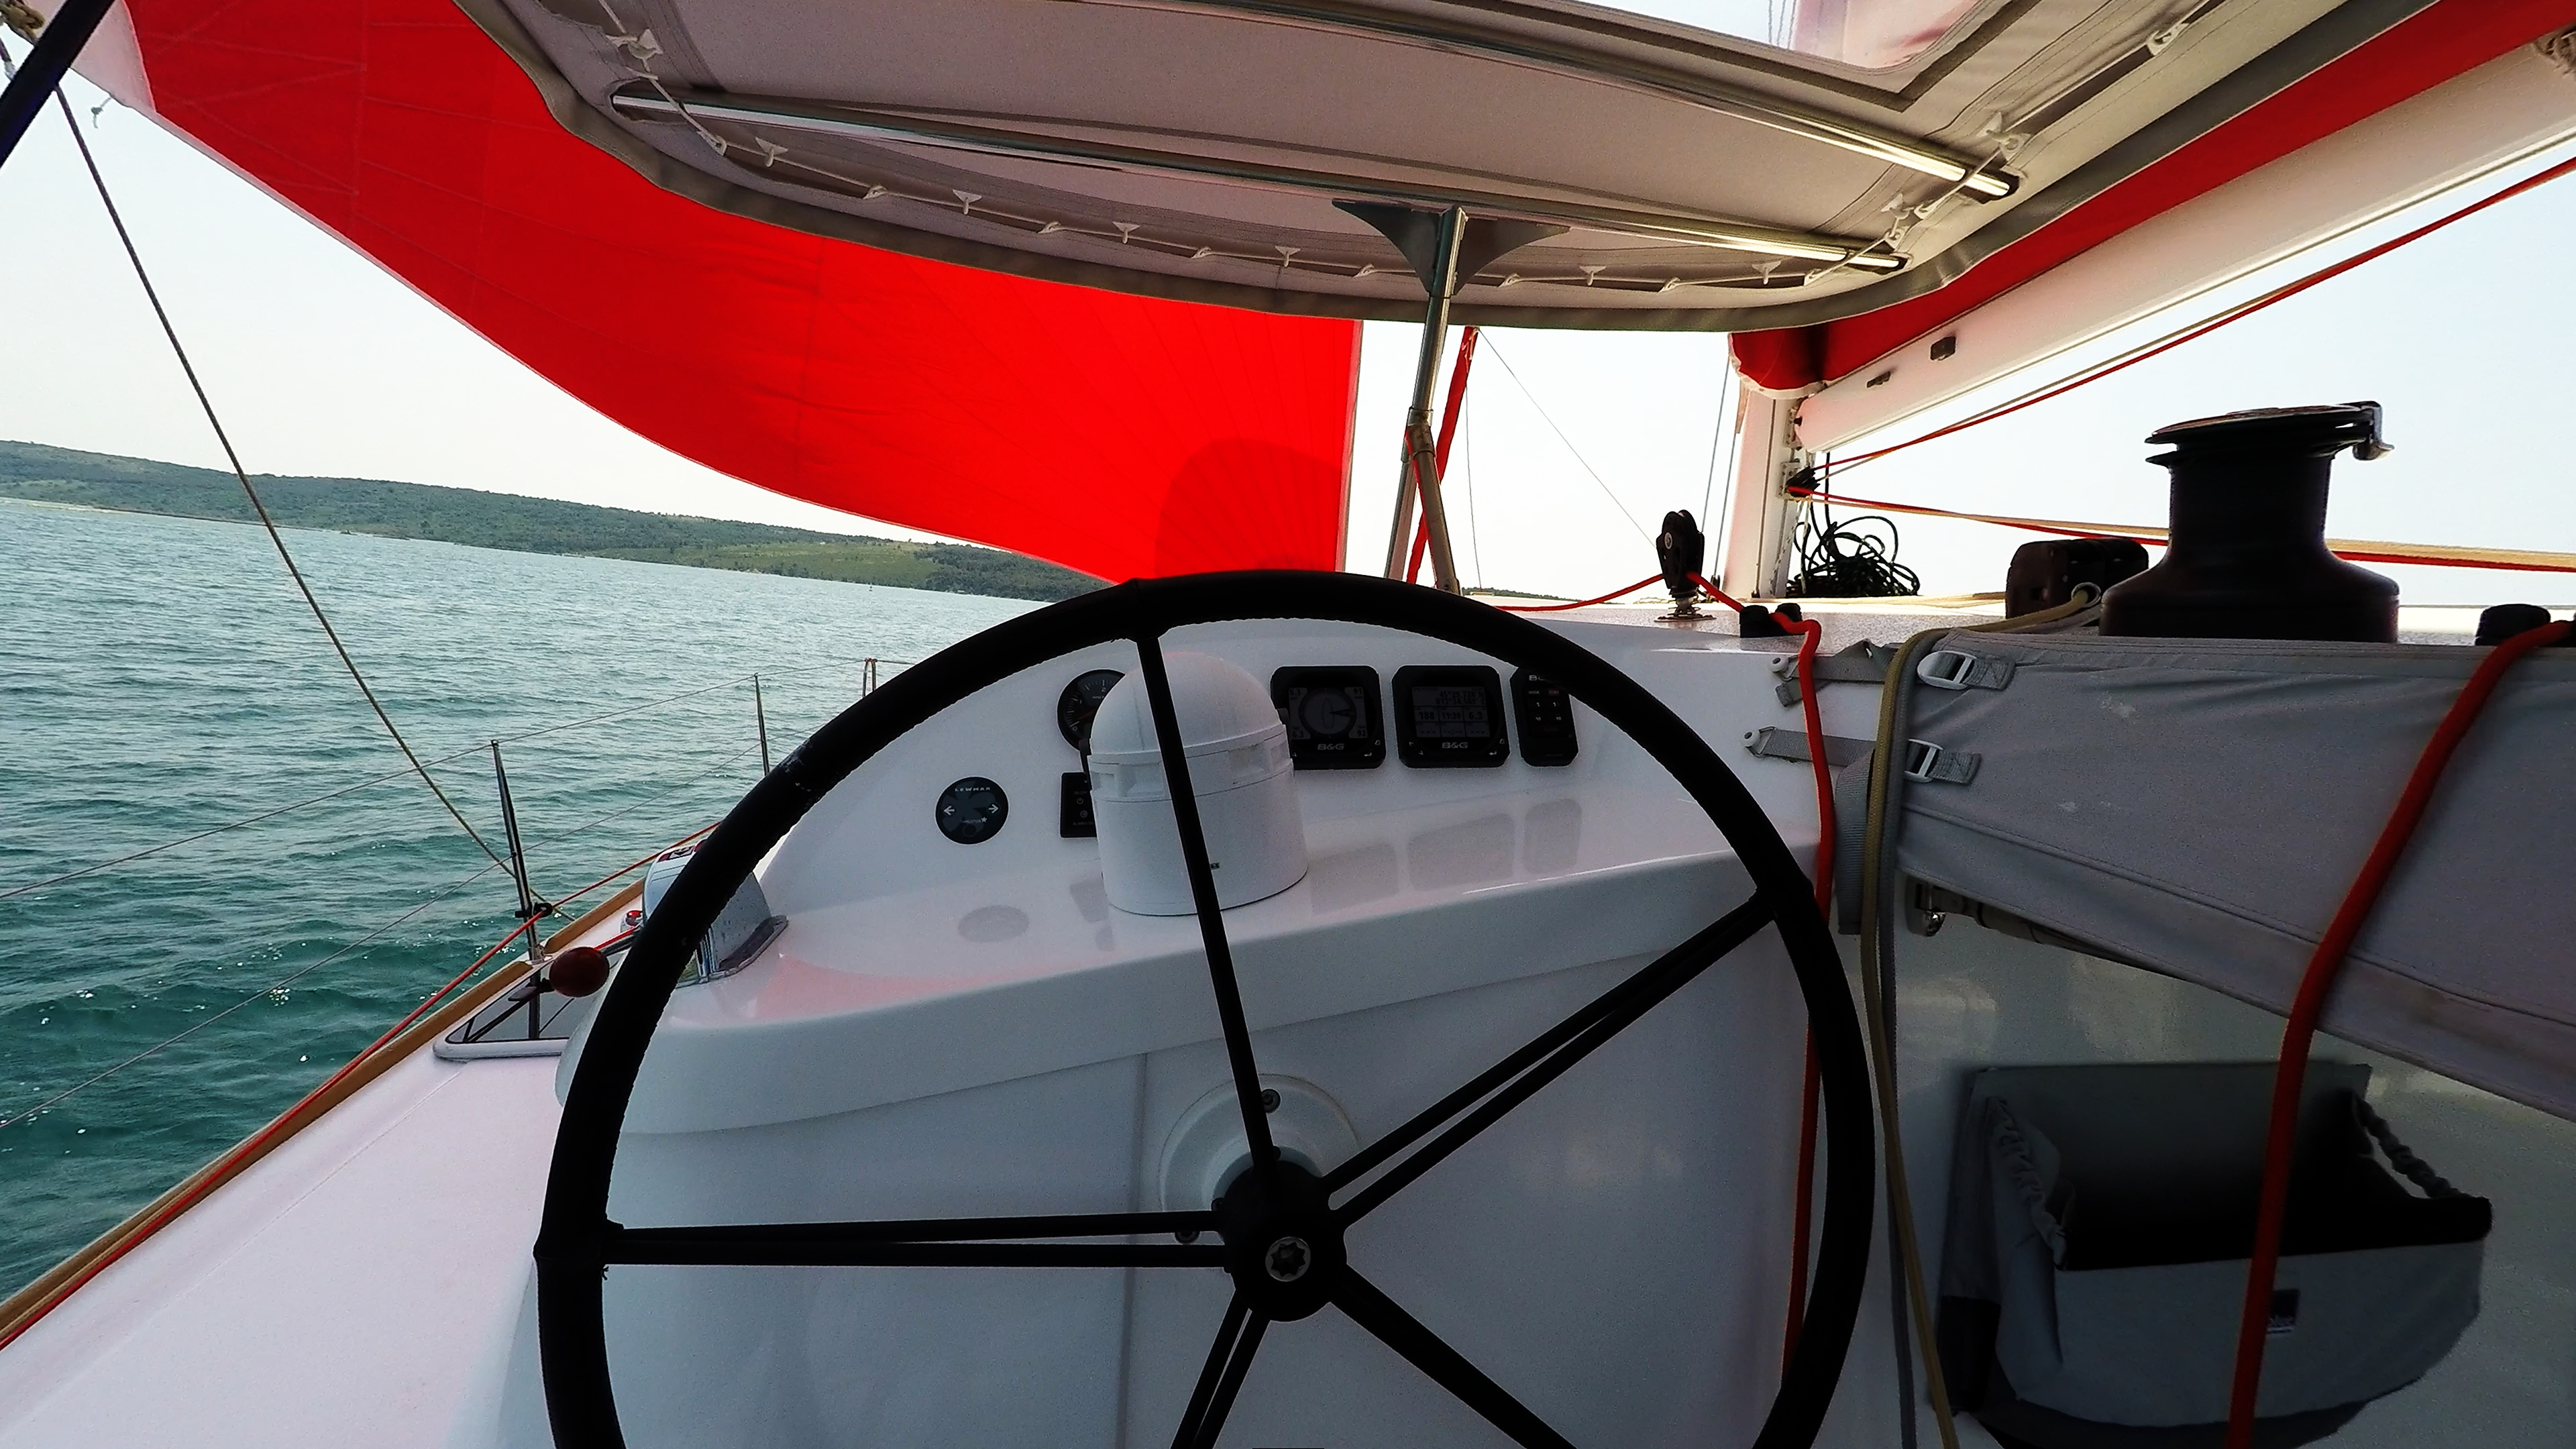 trimaran multihull sailing yacht neel 45 skipper cockpit steering wheel instruments gibb